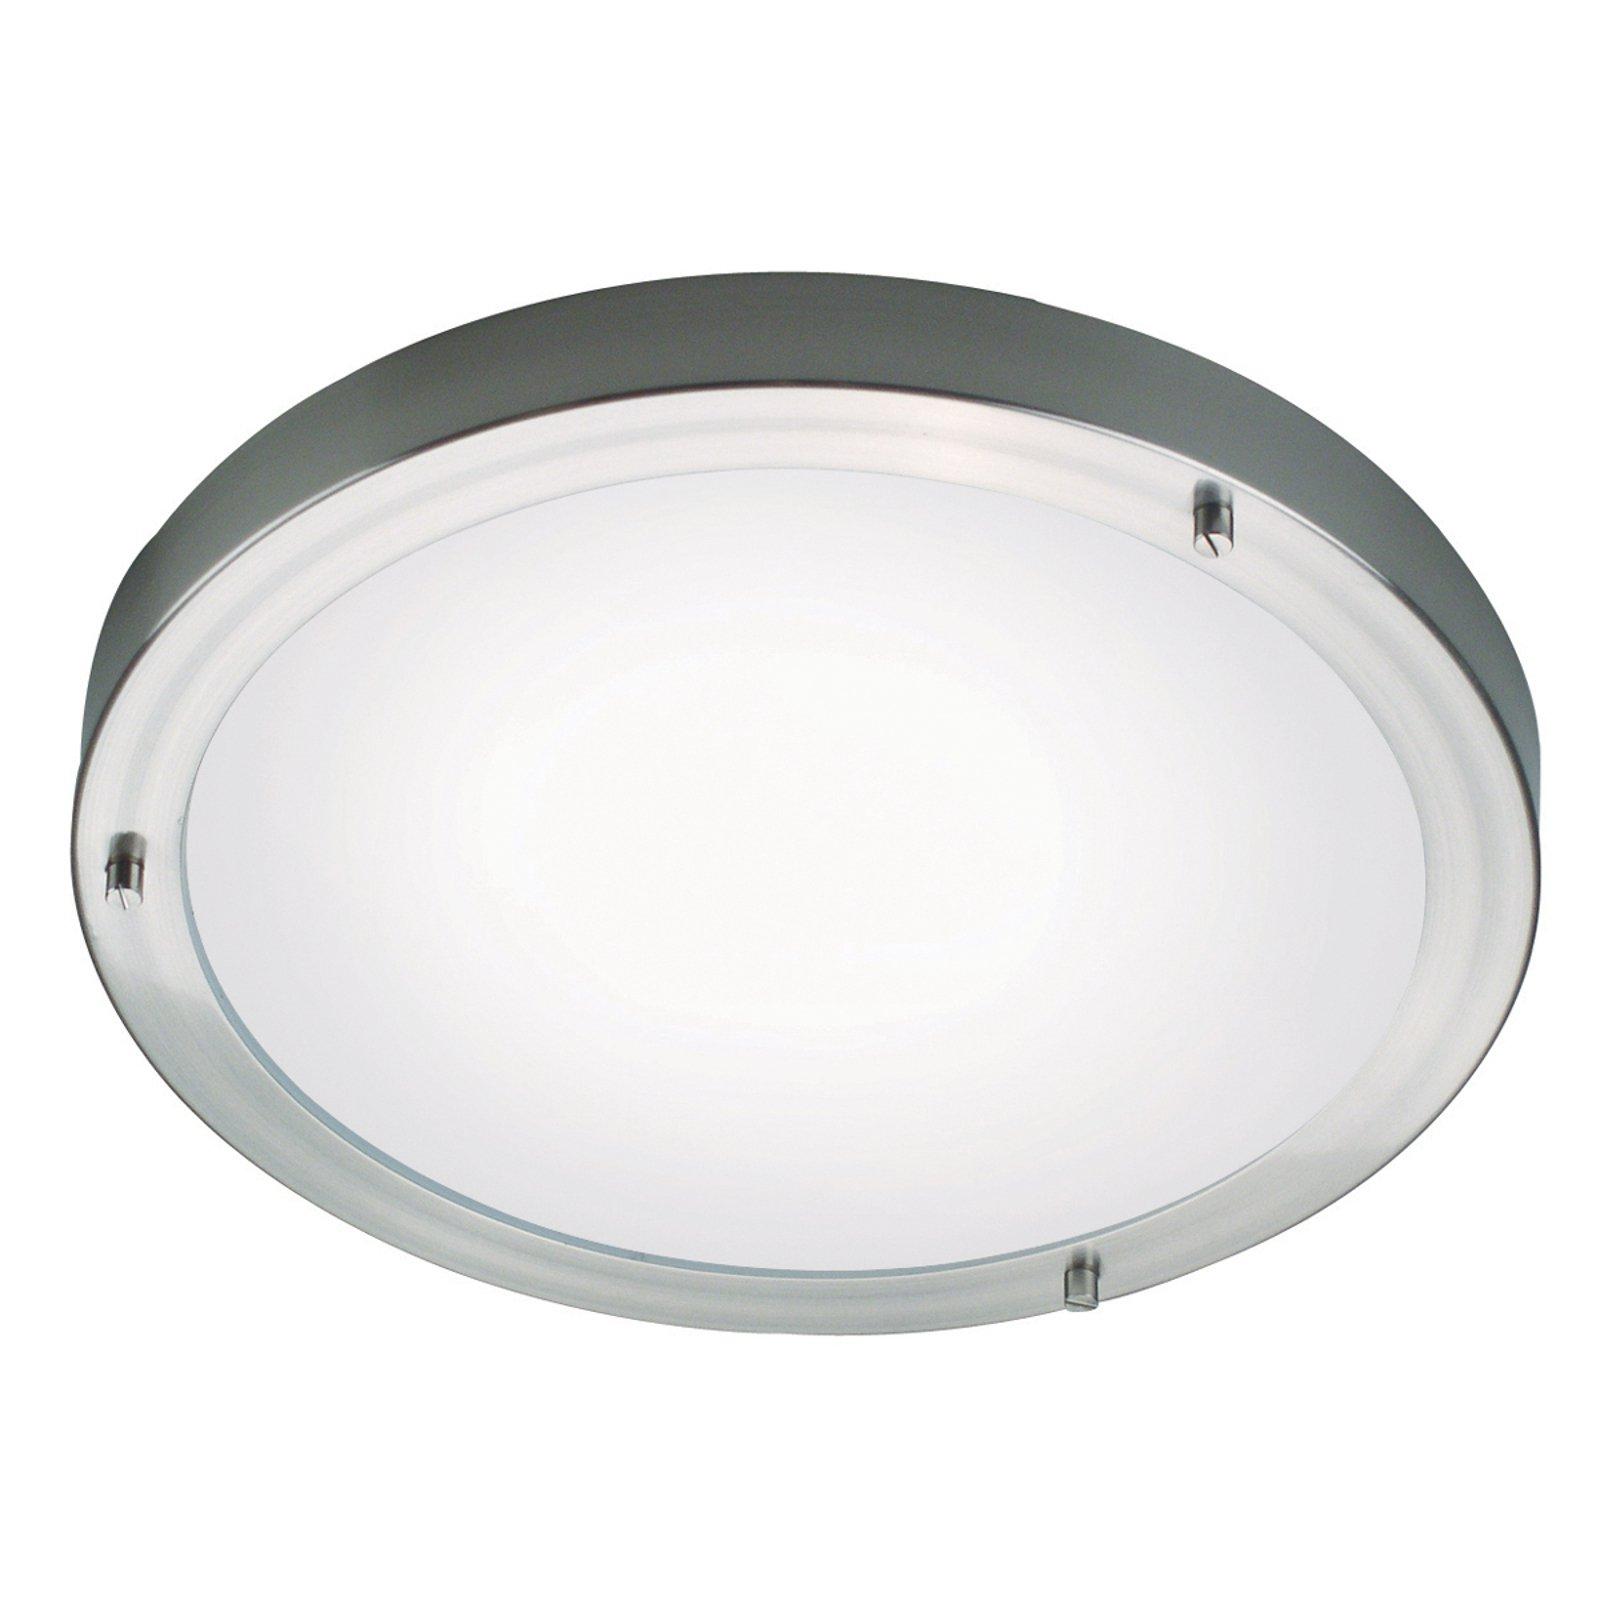 Anacona Maxi - LED taklampe med IP43